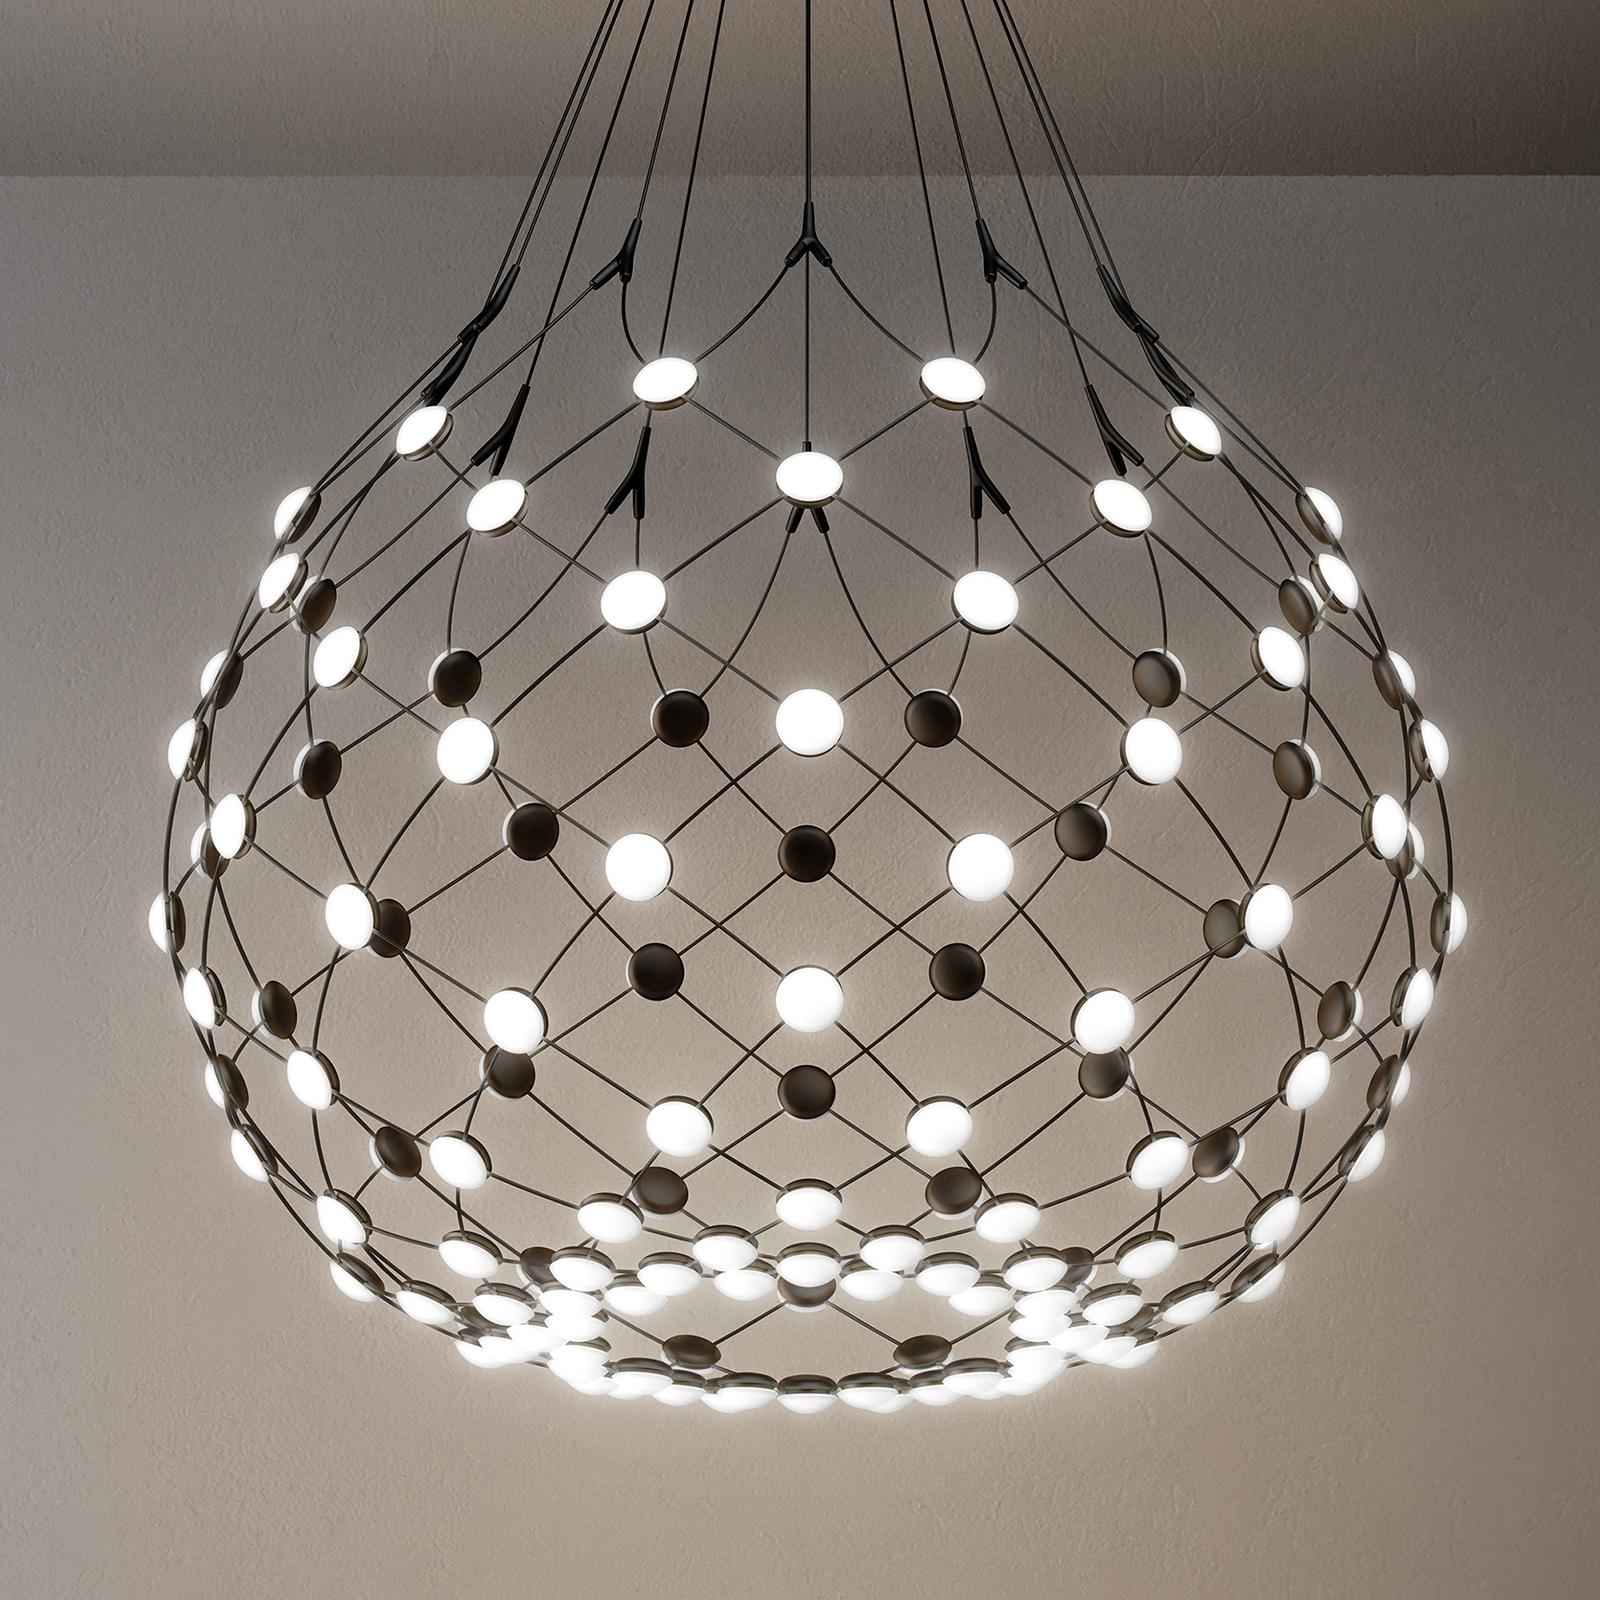 Luceplan Mesh LED-Hängelampe Ø 80cm 1m Abhängung